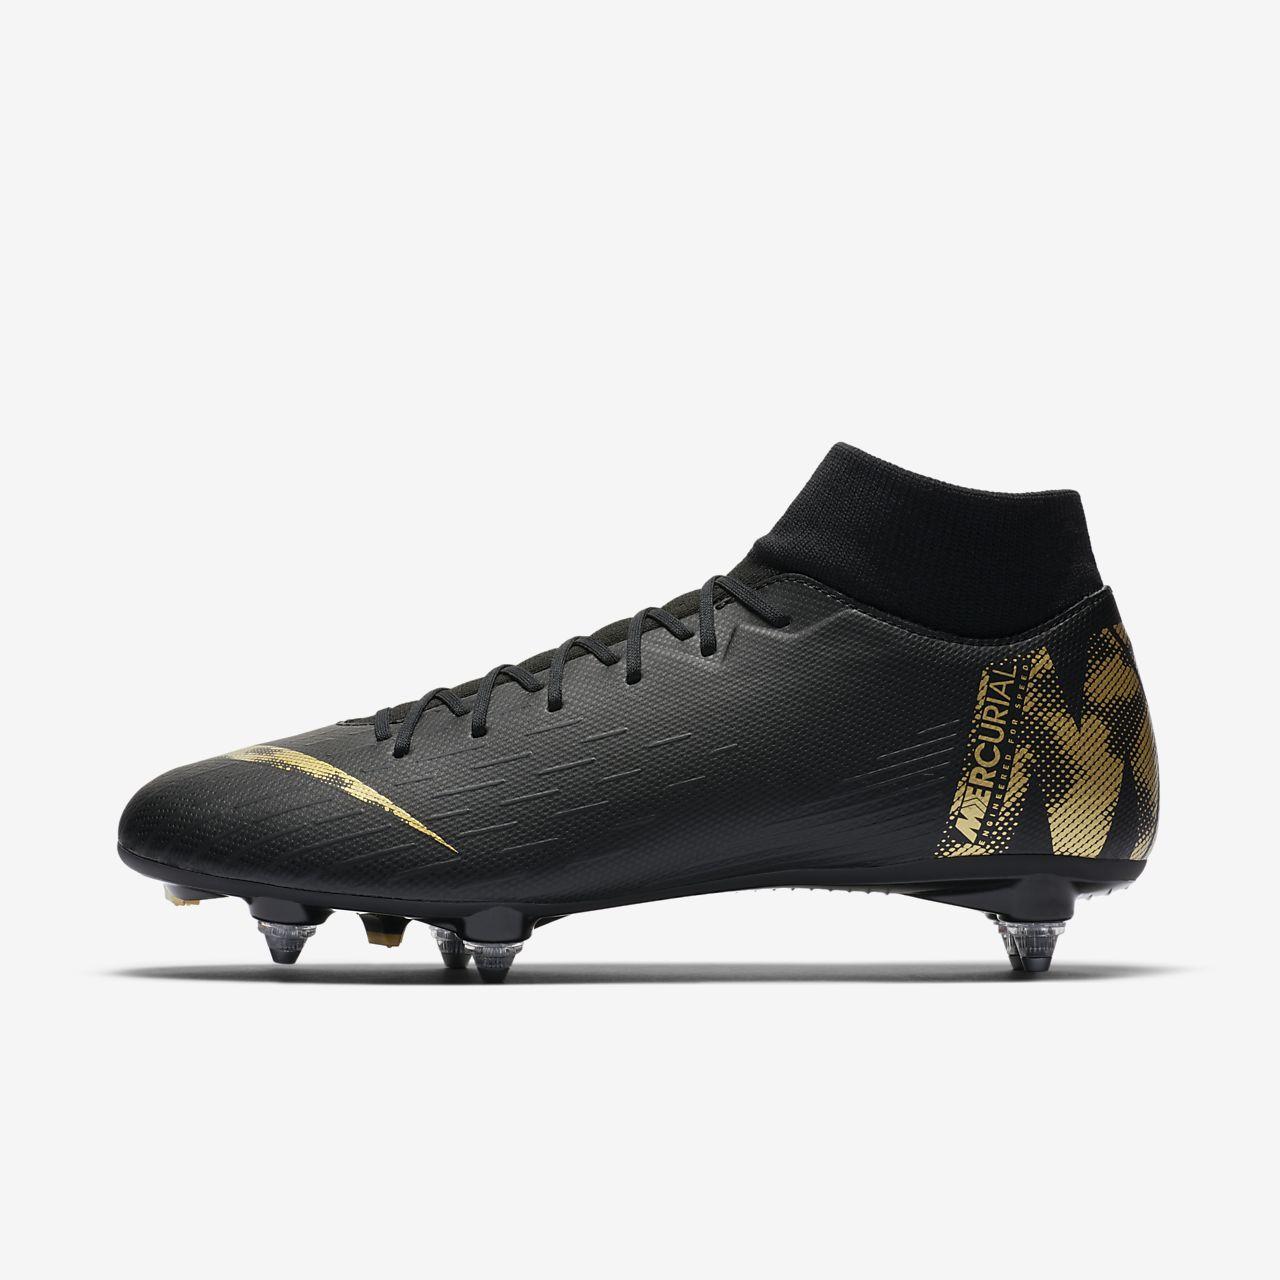 c446112e0591d De Nike Fútbol Sg Vi Botas Pro Superfly Mercurial Academy Para qBqPfw